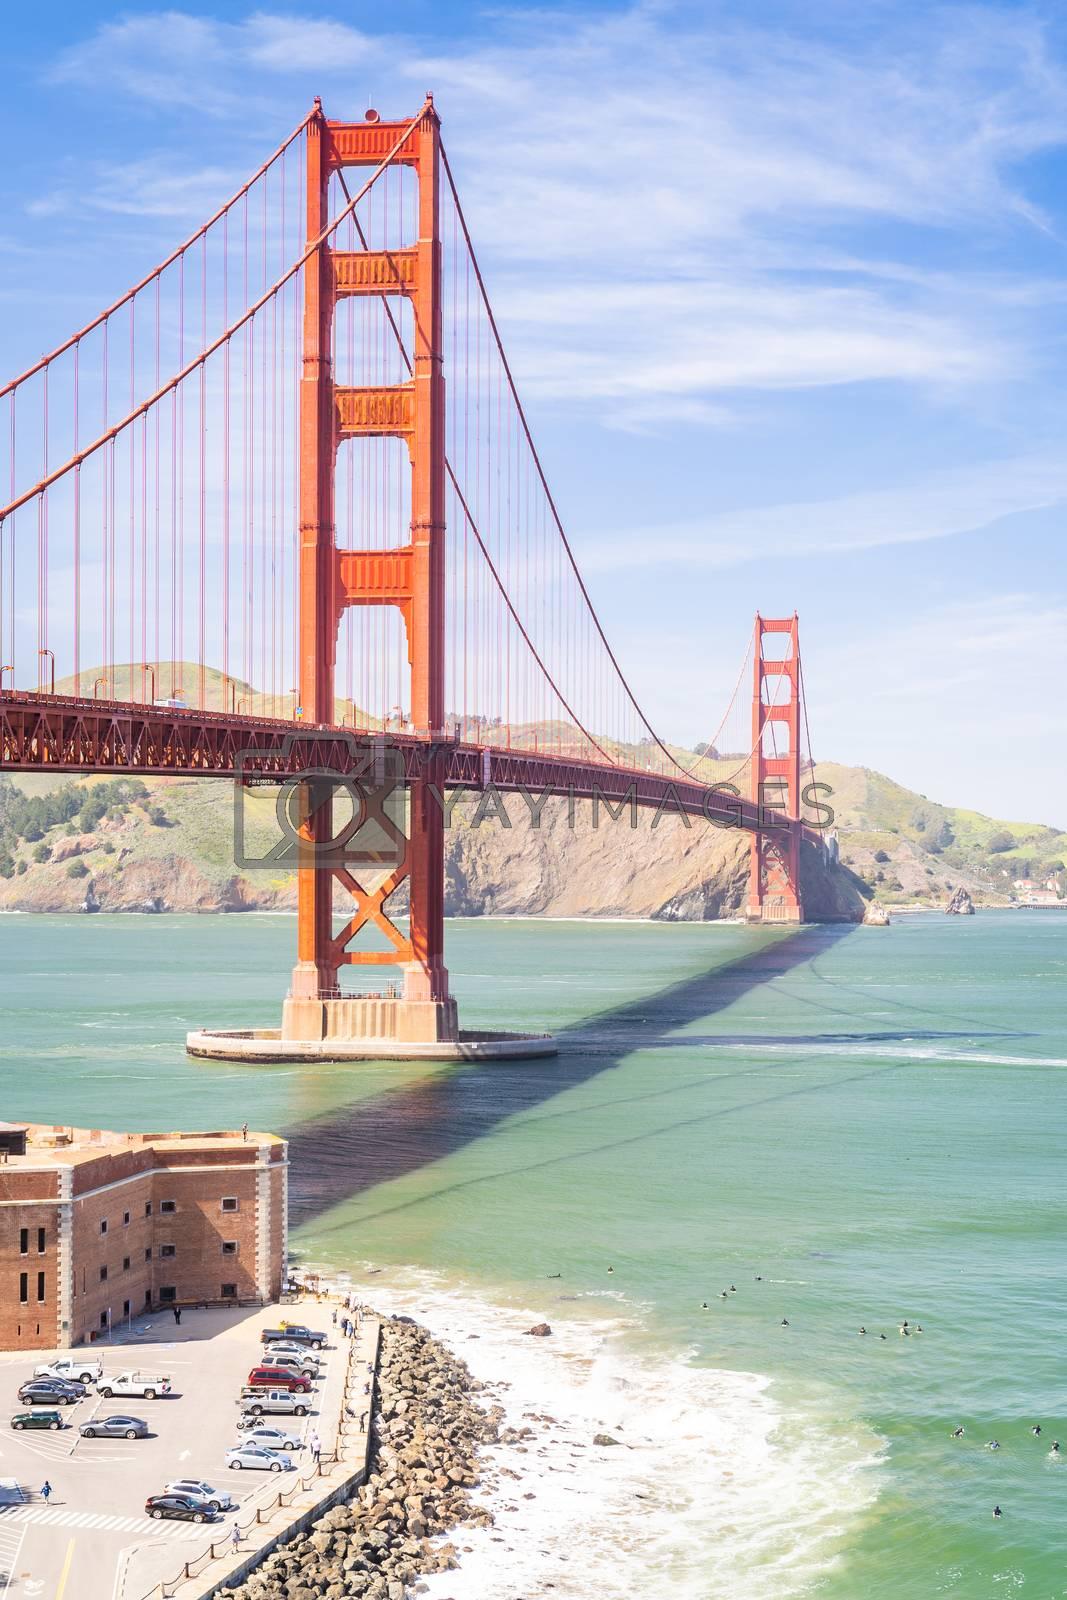 Golden Gate bridge in San Francisco California USA West Coast of Pacific Ocean